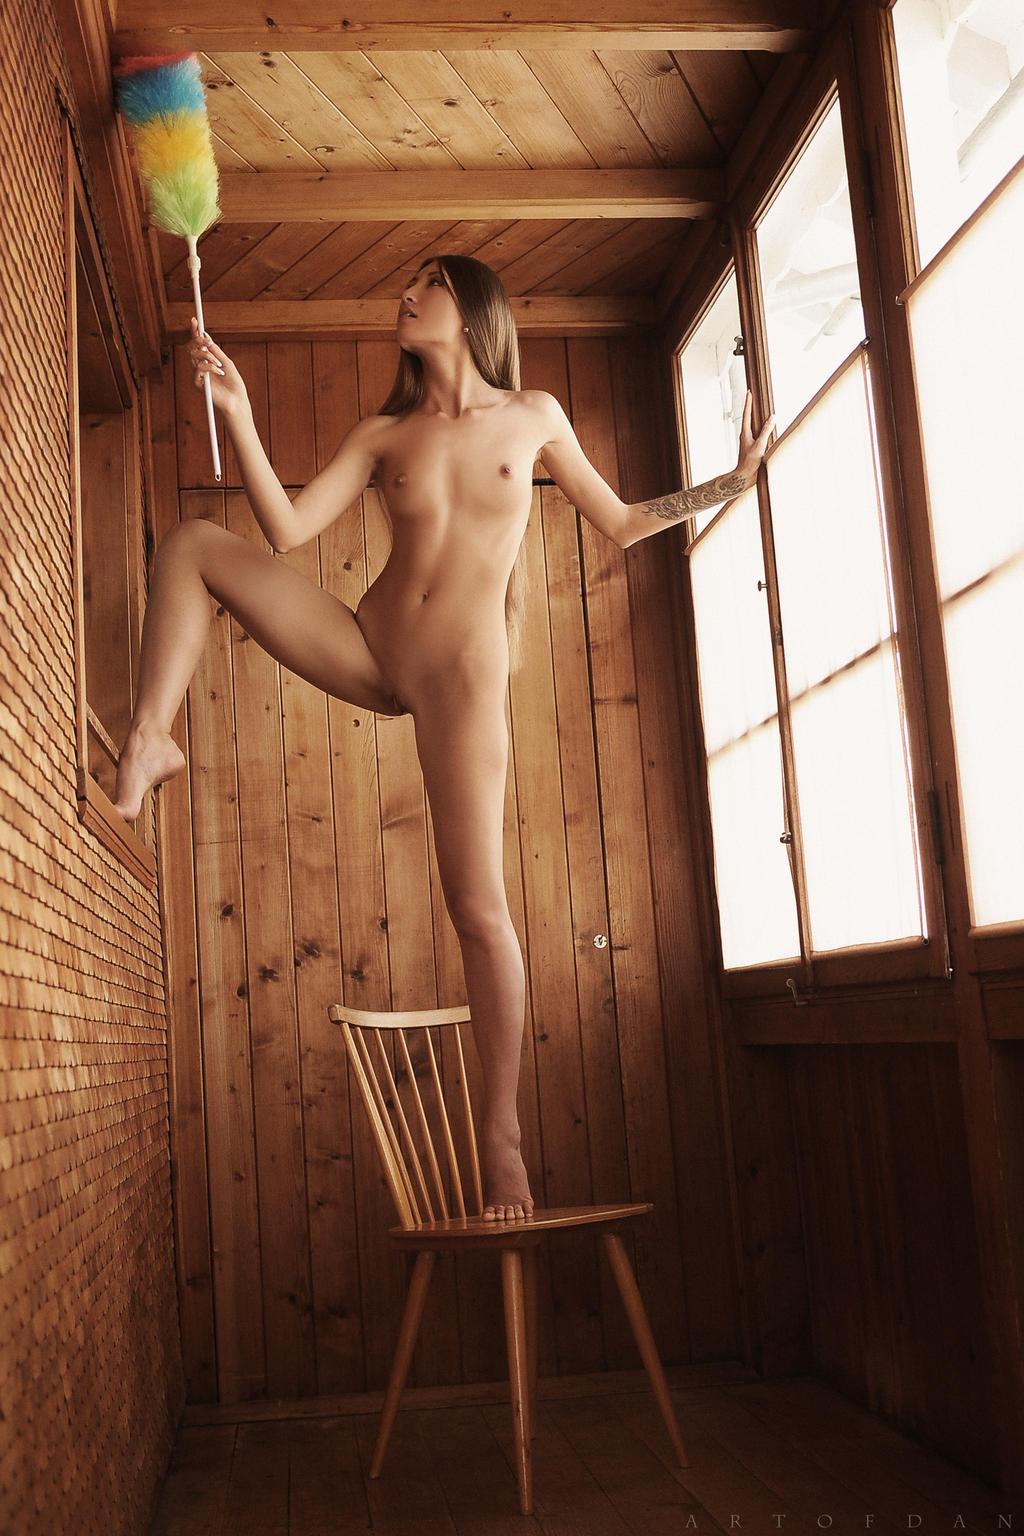 housekeeper_by_artofdanphotography_d8ce6